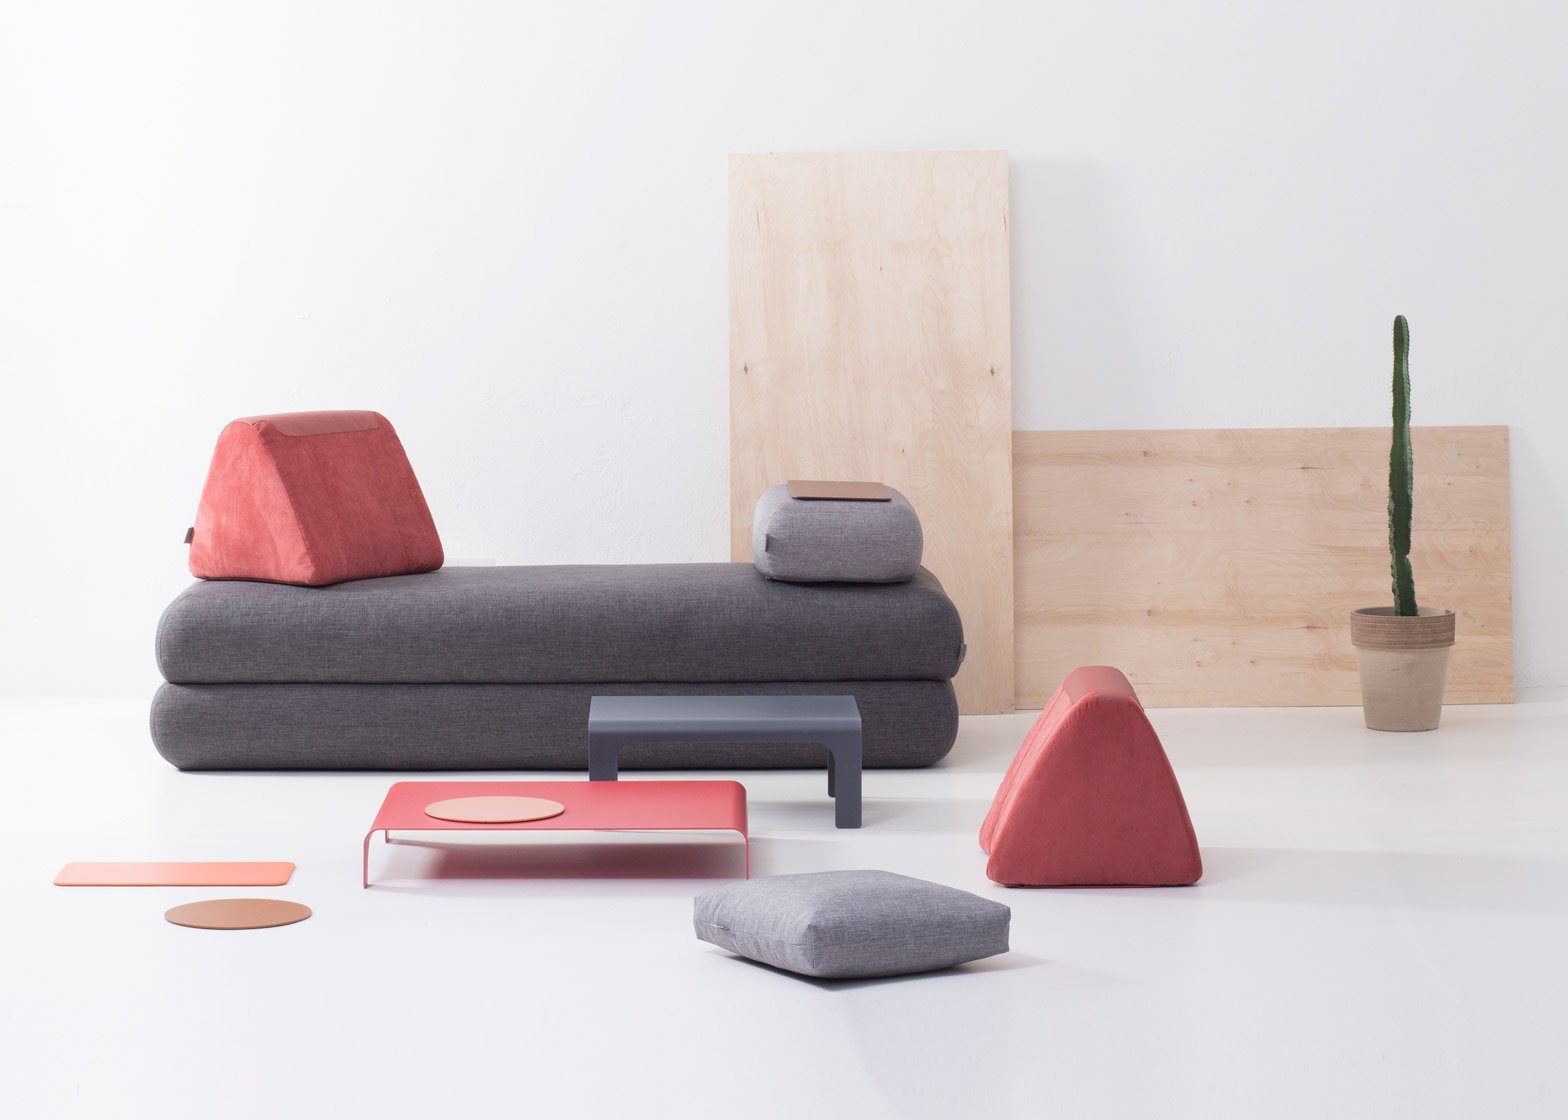 The Urban Nomad Sofa by Hannabi